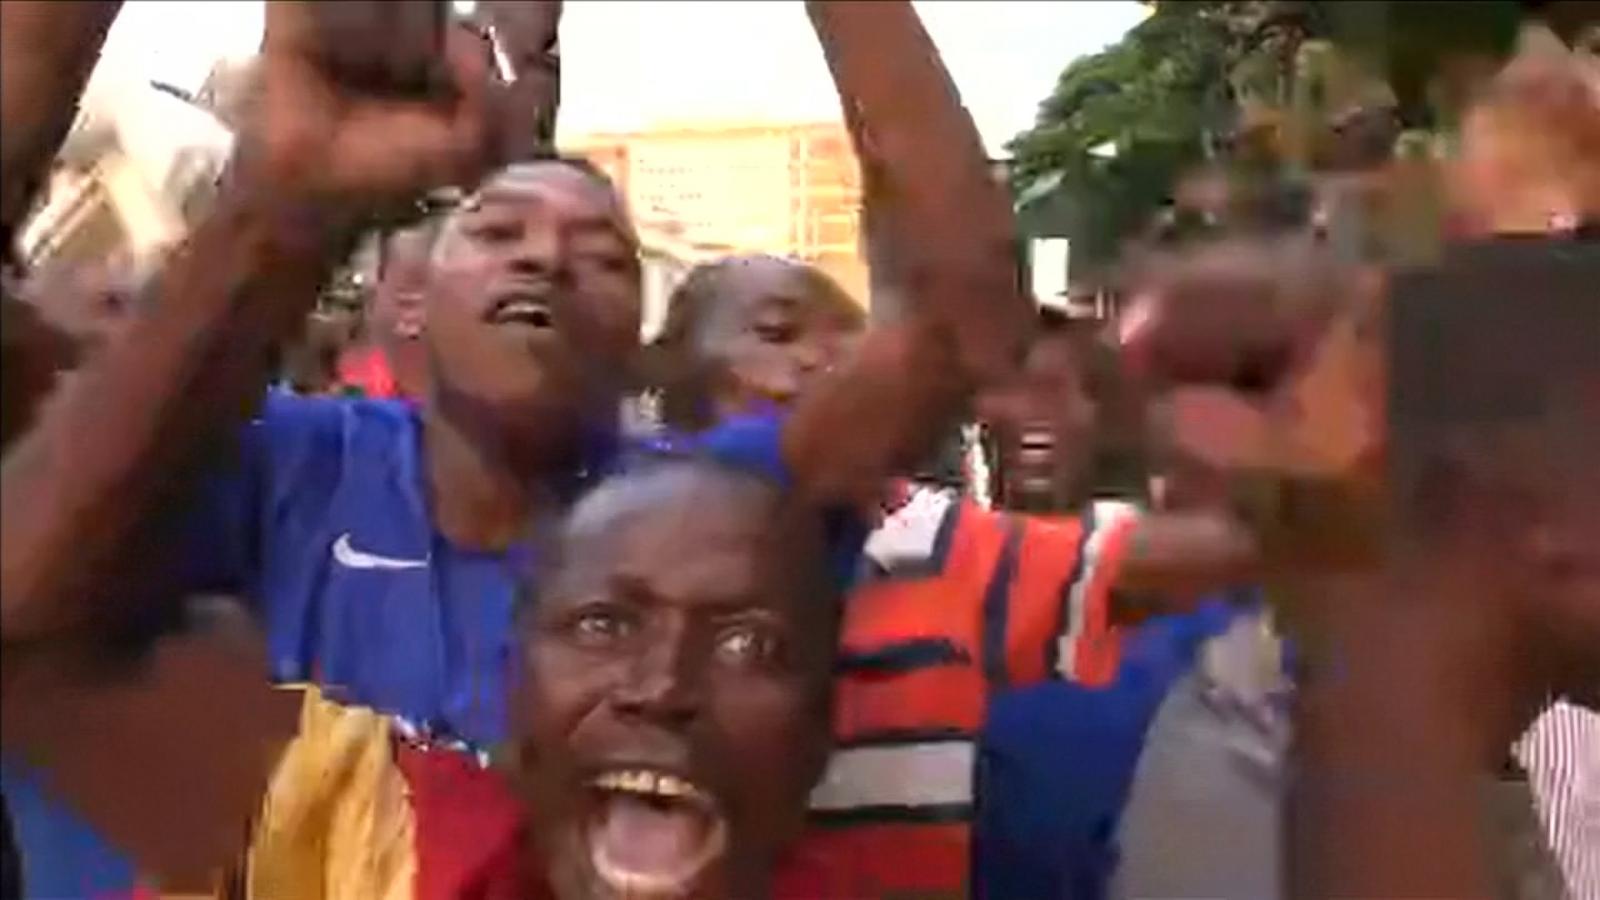 zimbabweans-celebrate-after-president-robert-mugabe-resigns